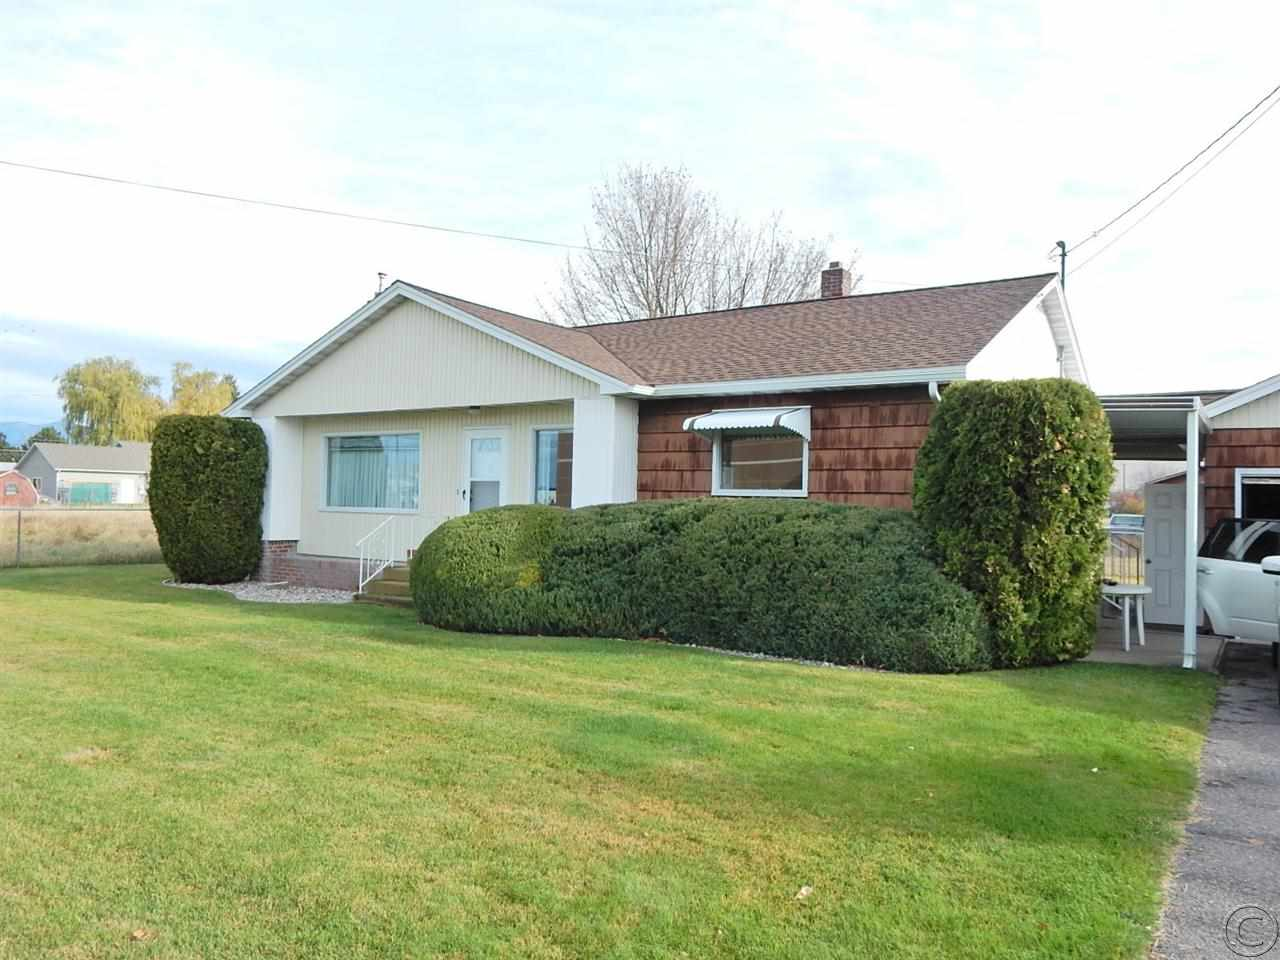 Real Estate for Sale, ListingId: 31719076, Missoula,MT59801